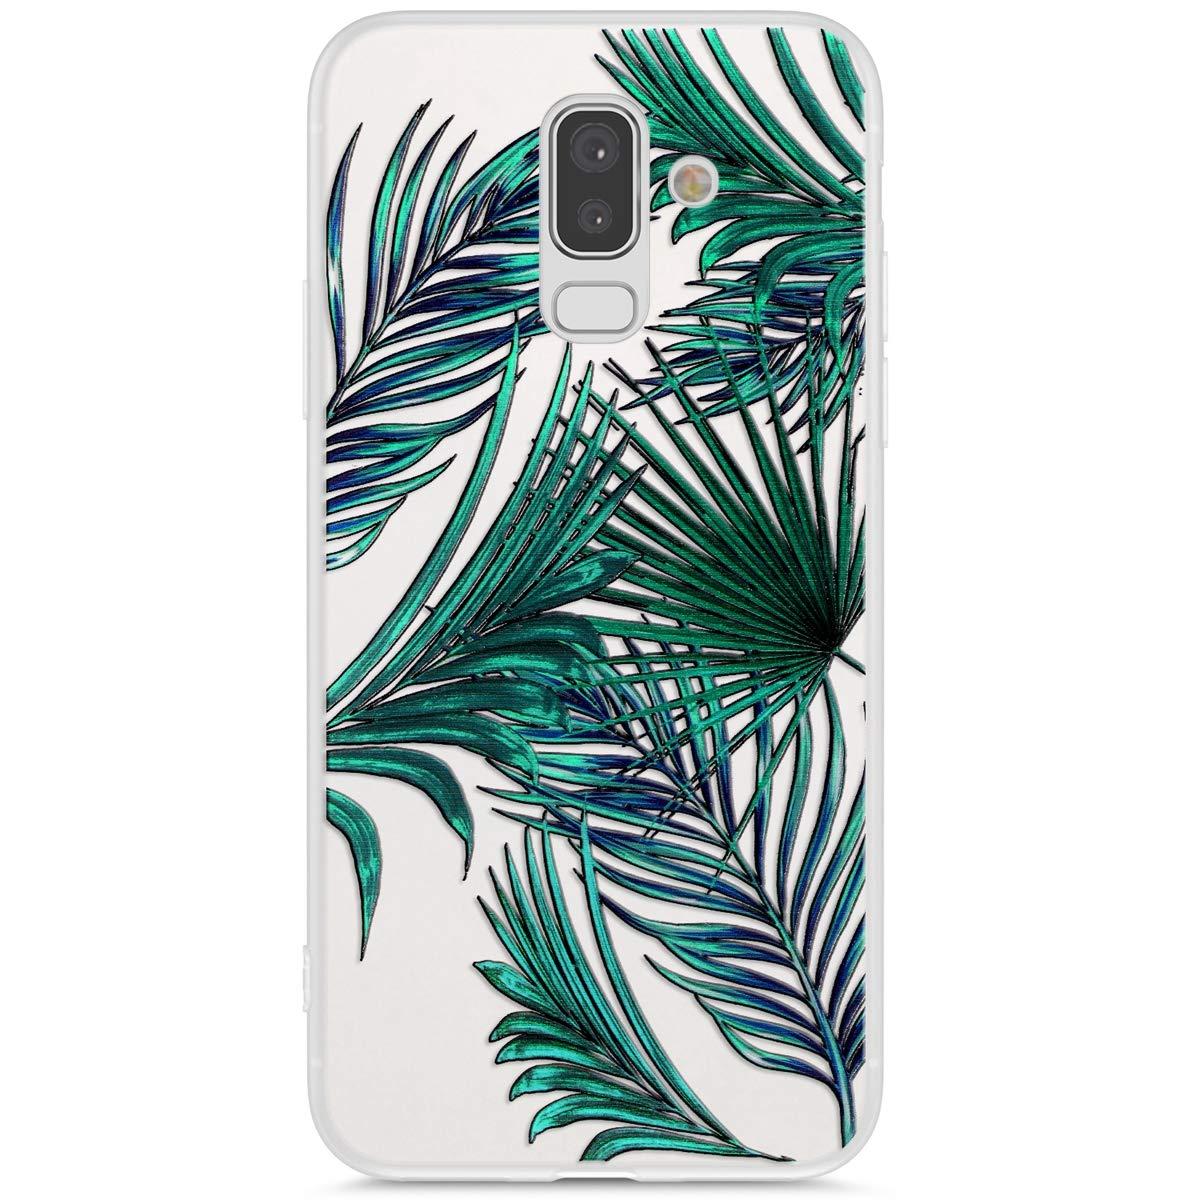 Uposao Coque Compatible avec Samsung Galaxy J8 2018 Coque Matte Etui Premium Semi Transparent Motif Palme Coque Soft TPU Silicone Anti-Choc Bumper Ultra Mince Hybrid Slim Case Coque Galaxy J8 2018